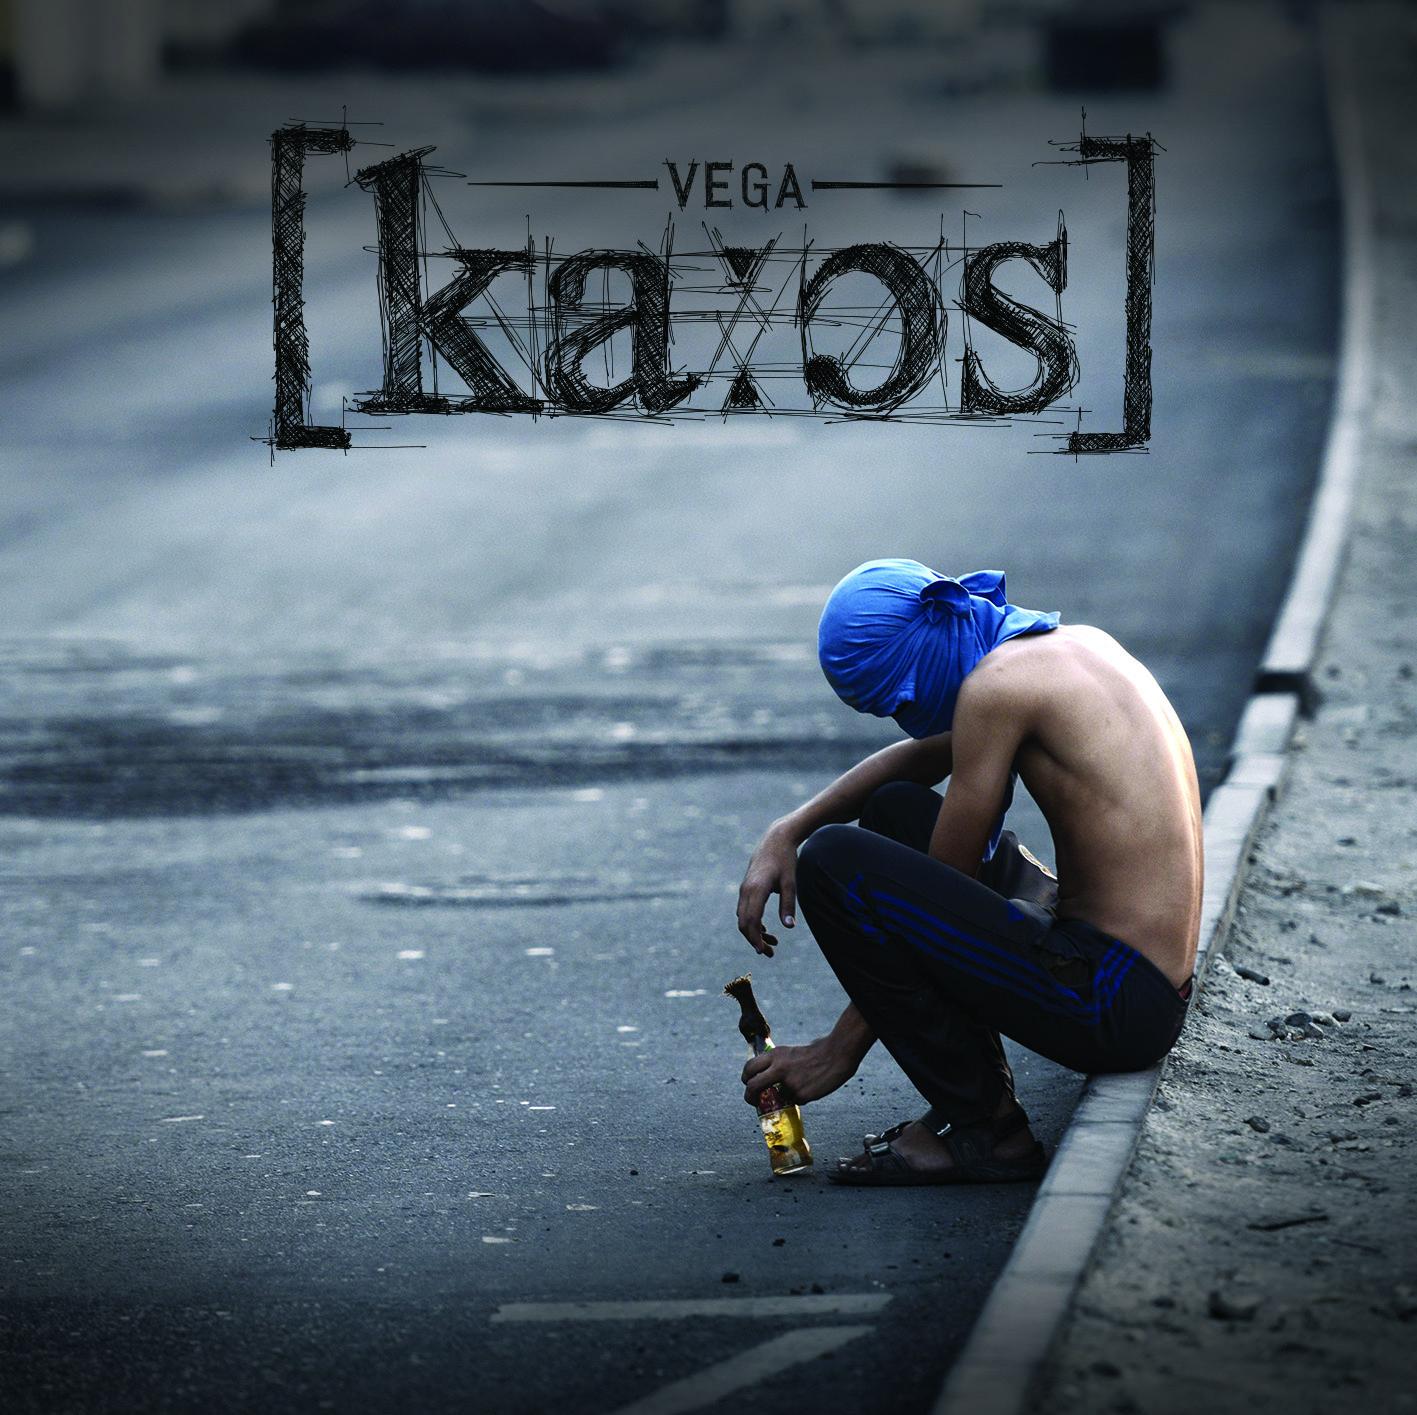 Vega - Kaos (Review) - rap.de